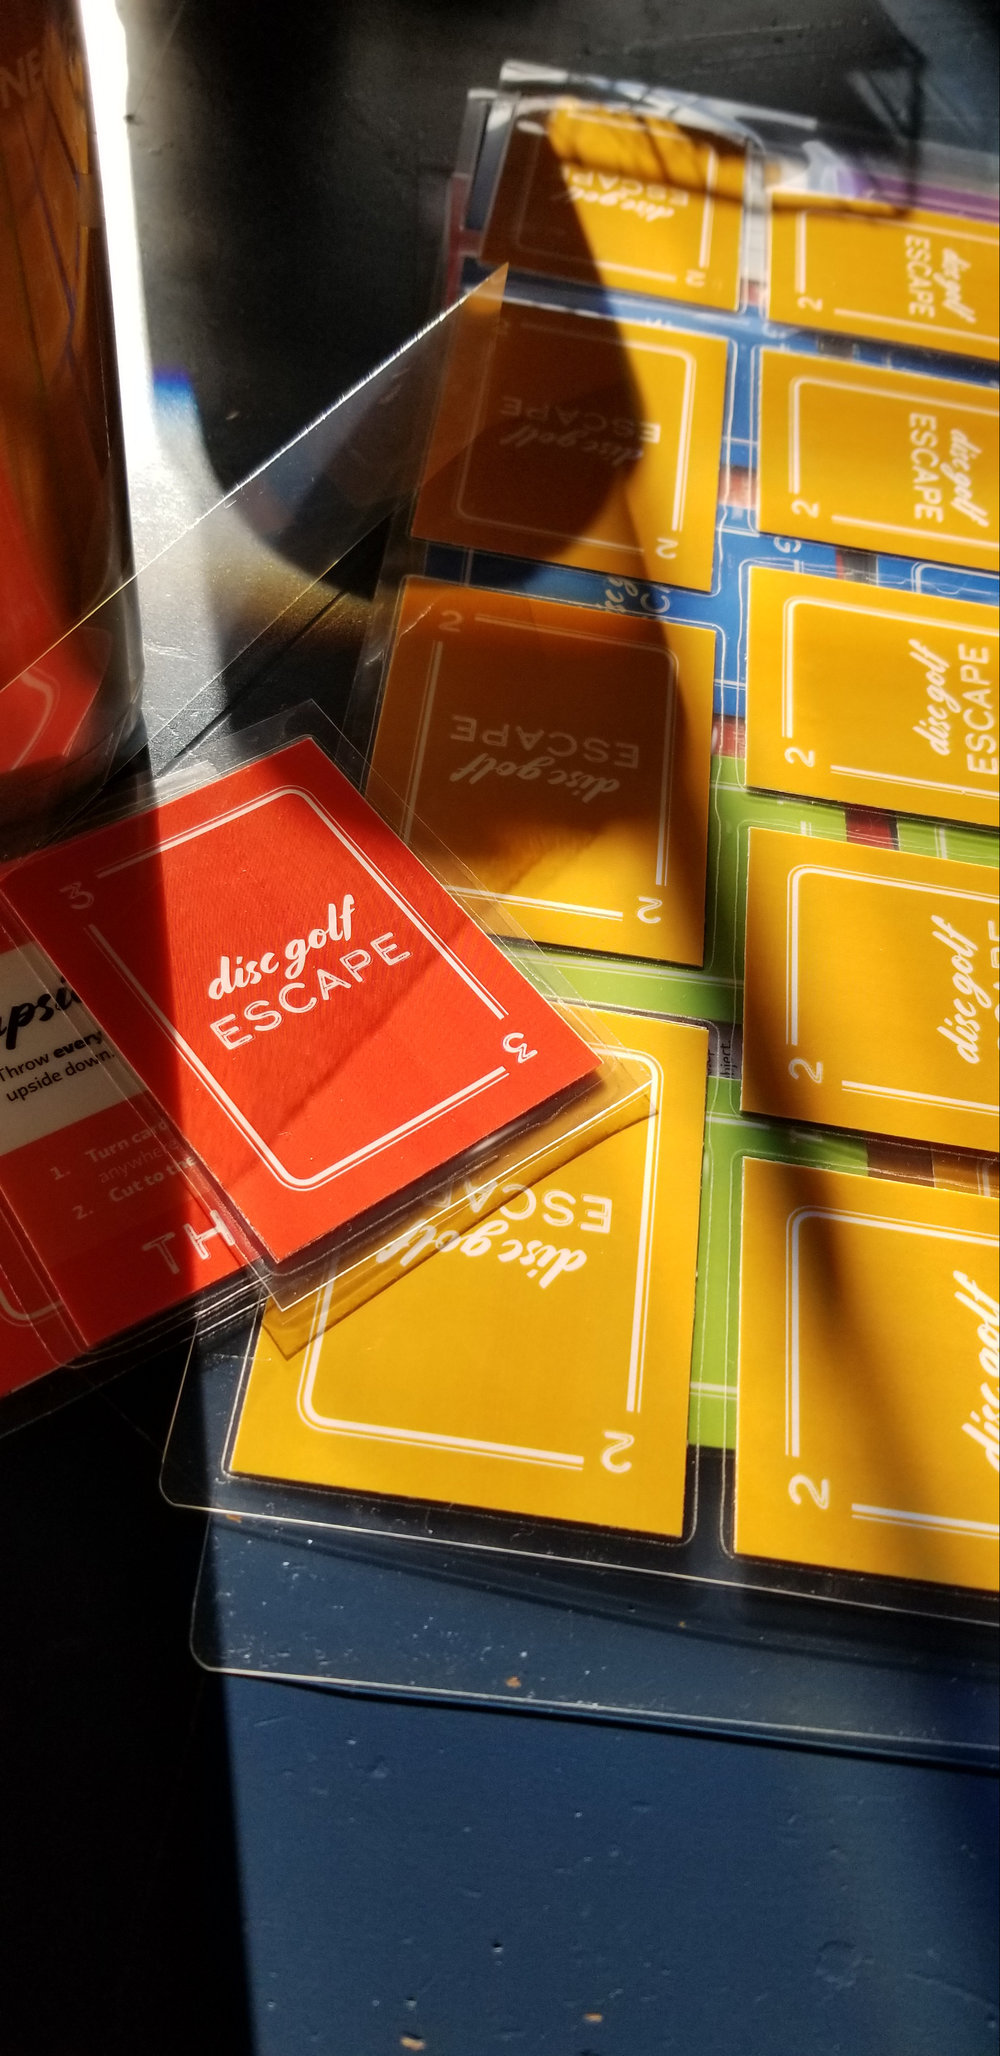 disc-golf-card-game-backyard-indoors.jpg